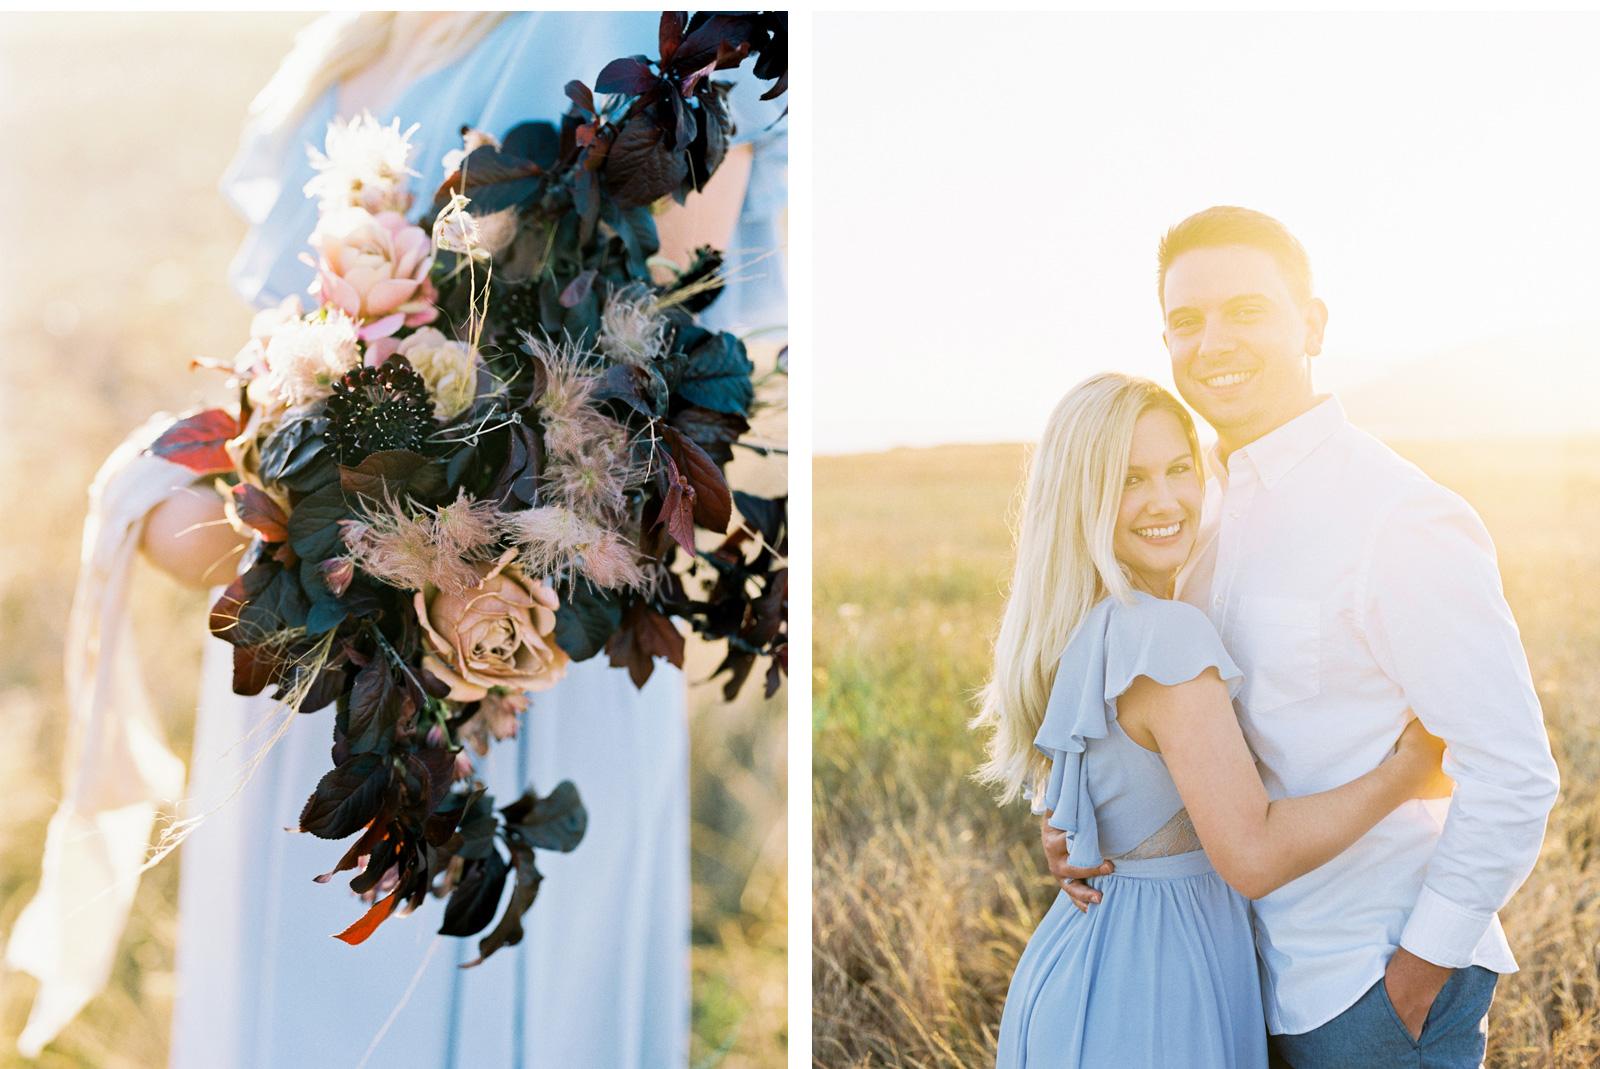 Malibu-Wedding-Photographer-Natalie-Schutt-Photography_02.jpg